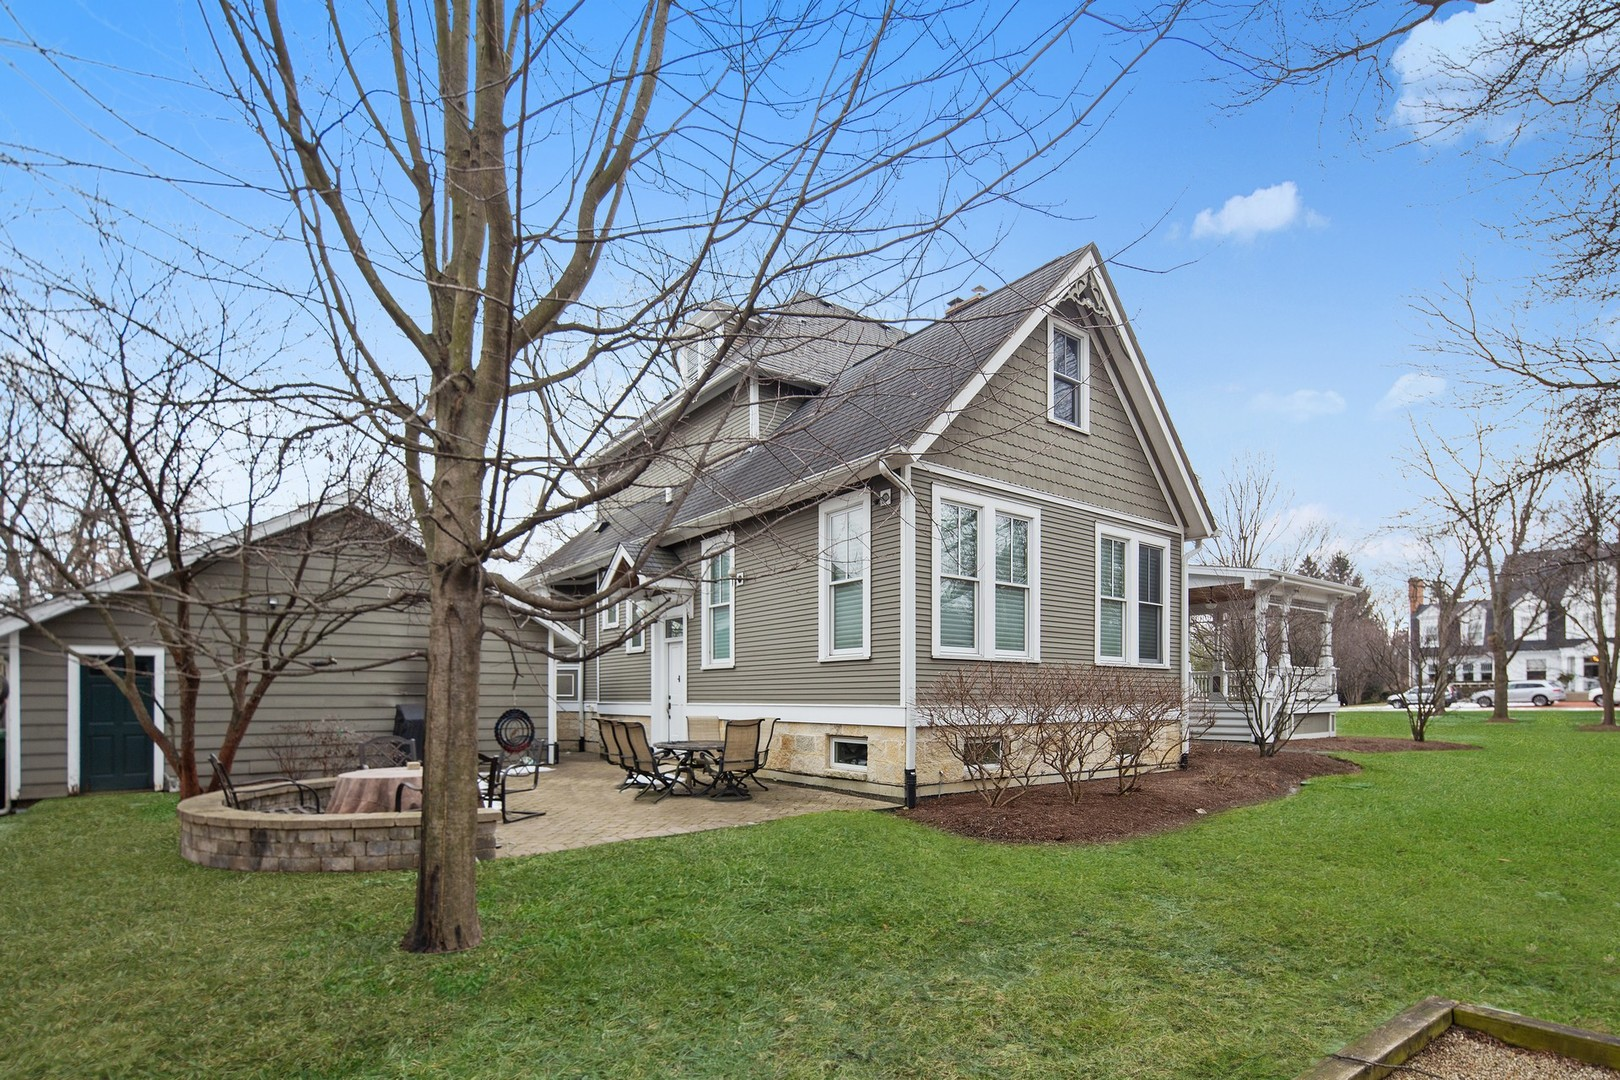 317 1st ,Hinsdale, Illinois 60521